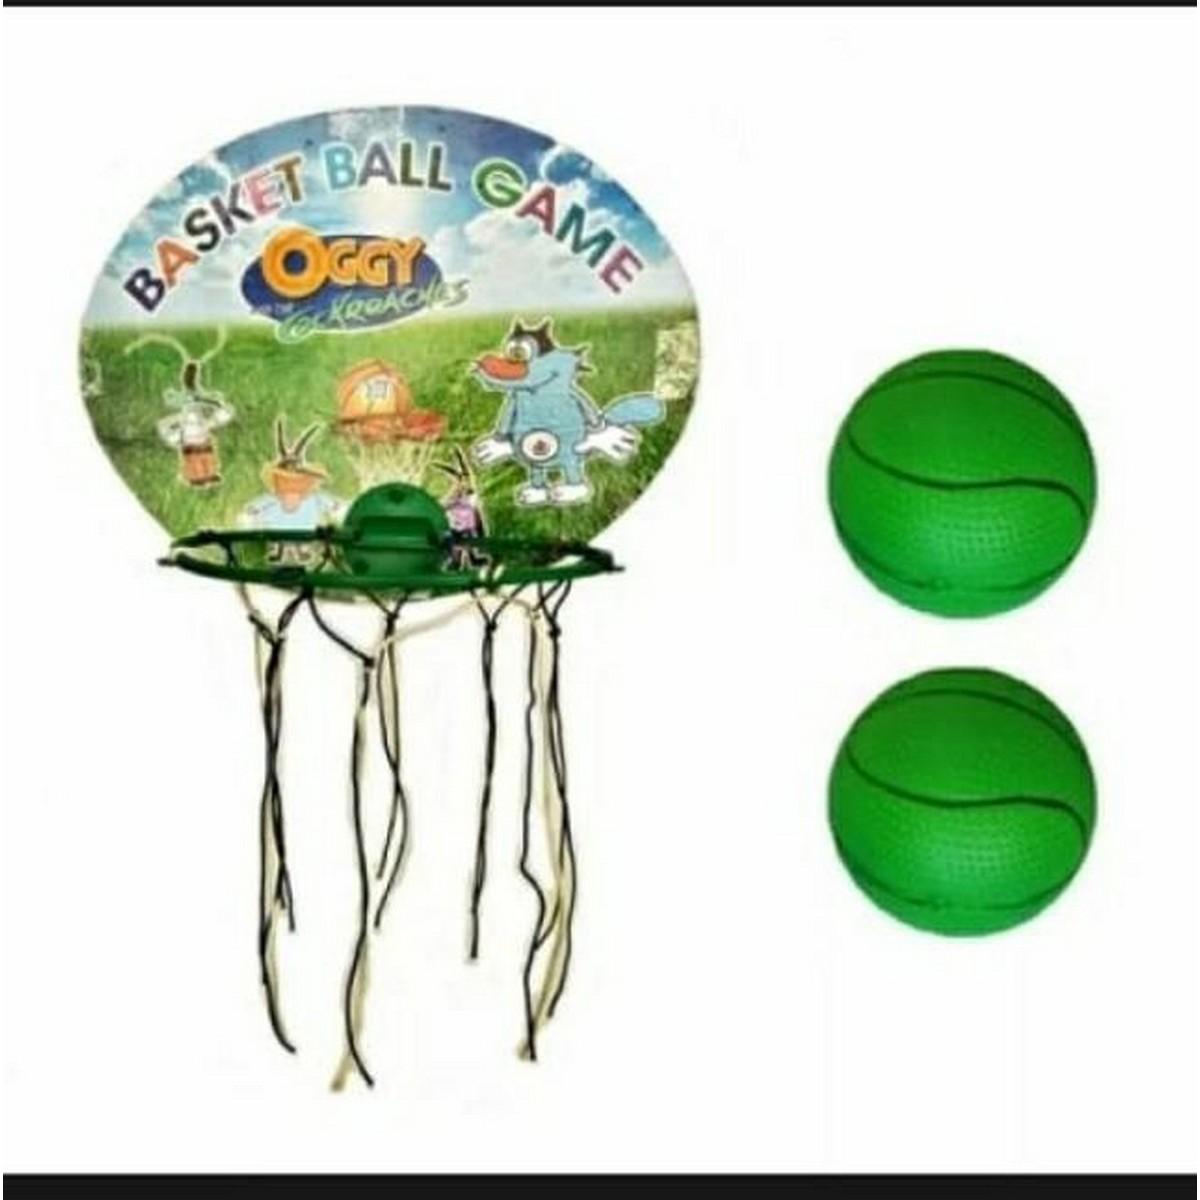 Basket ball set with 2 balls folding basket for kids.